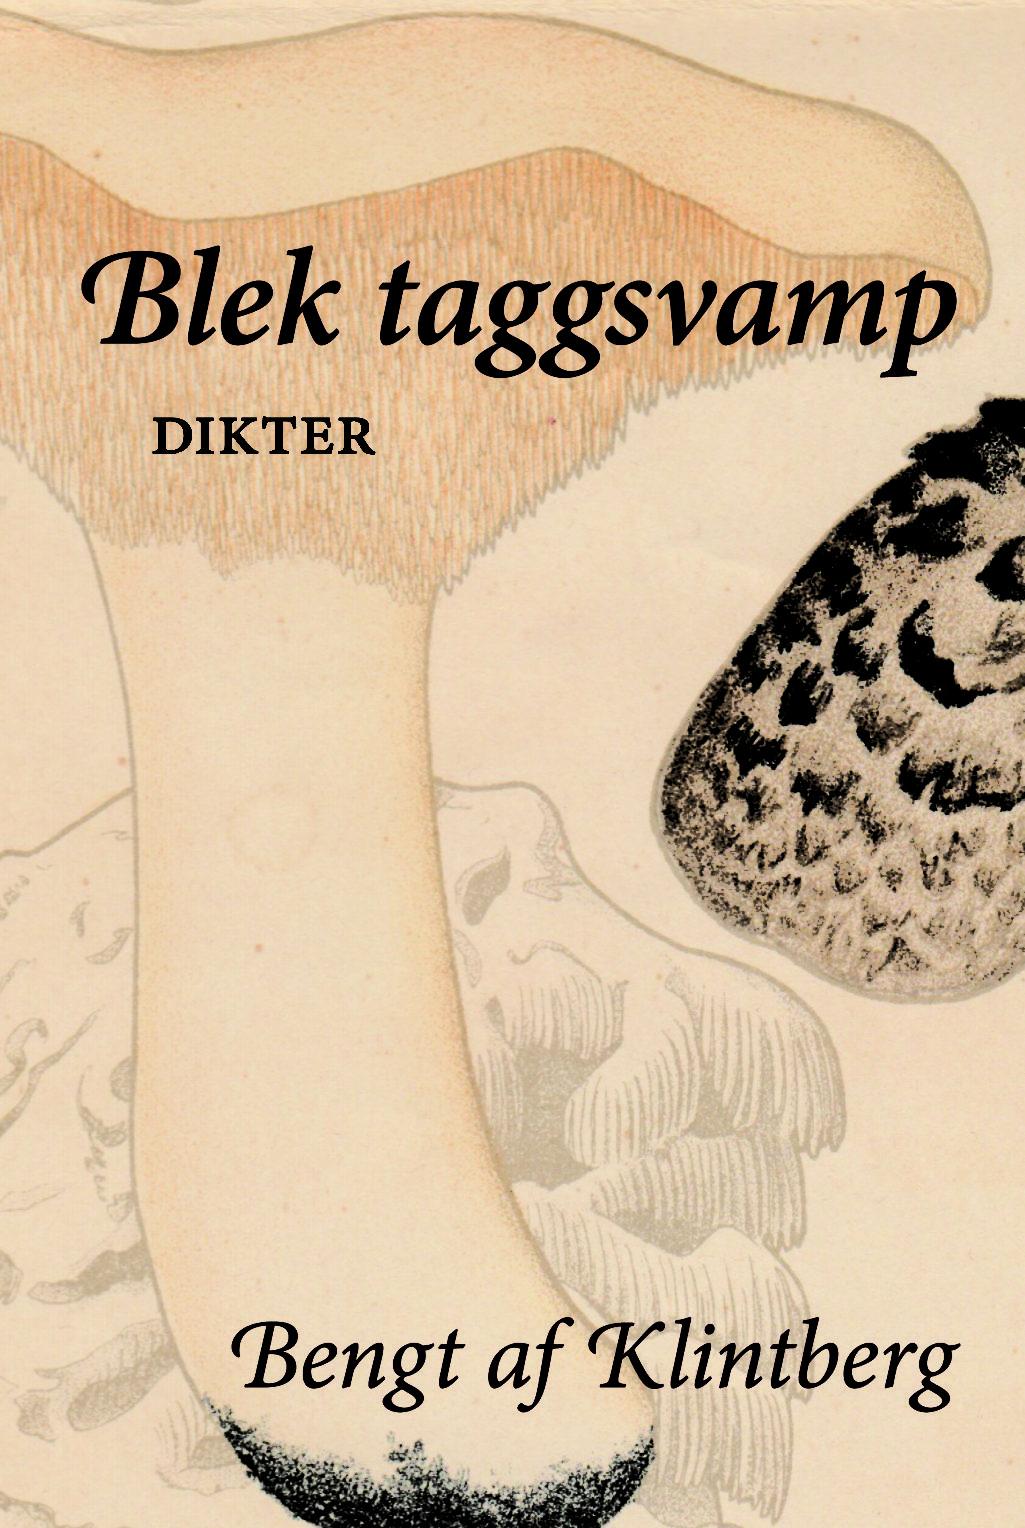 blek-taggsvamp-2